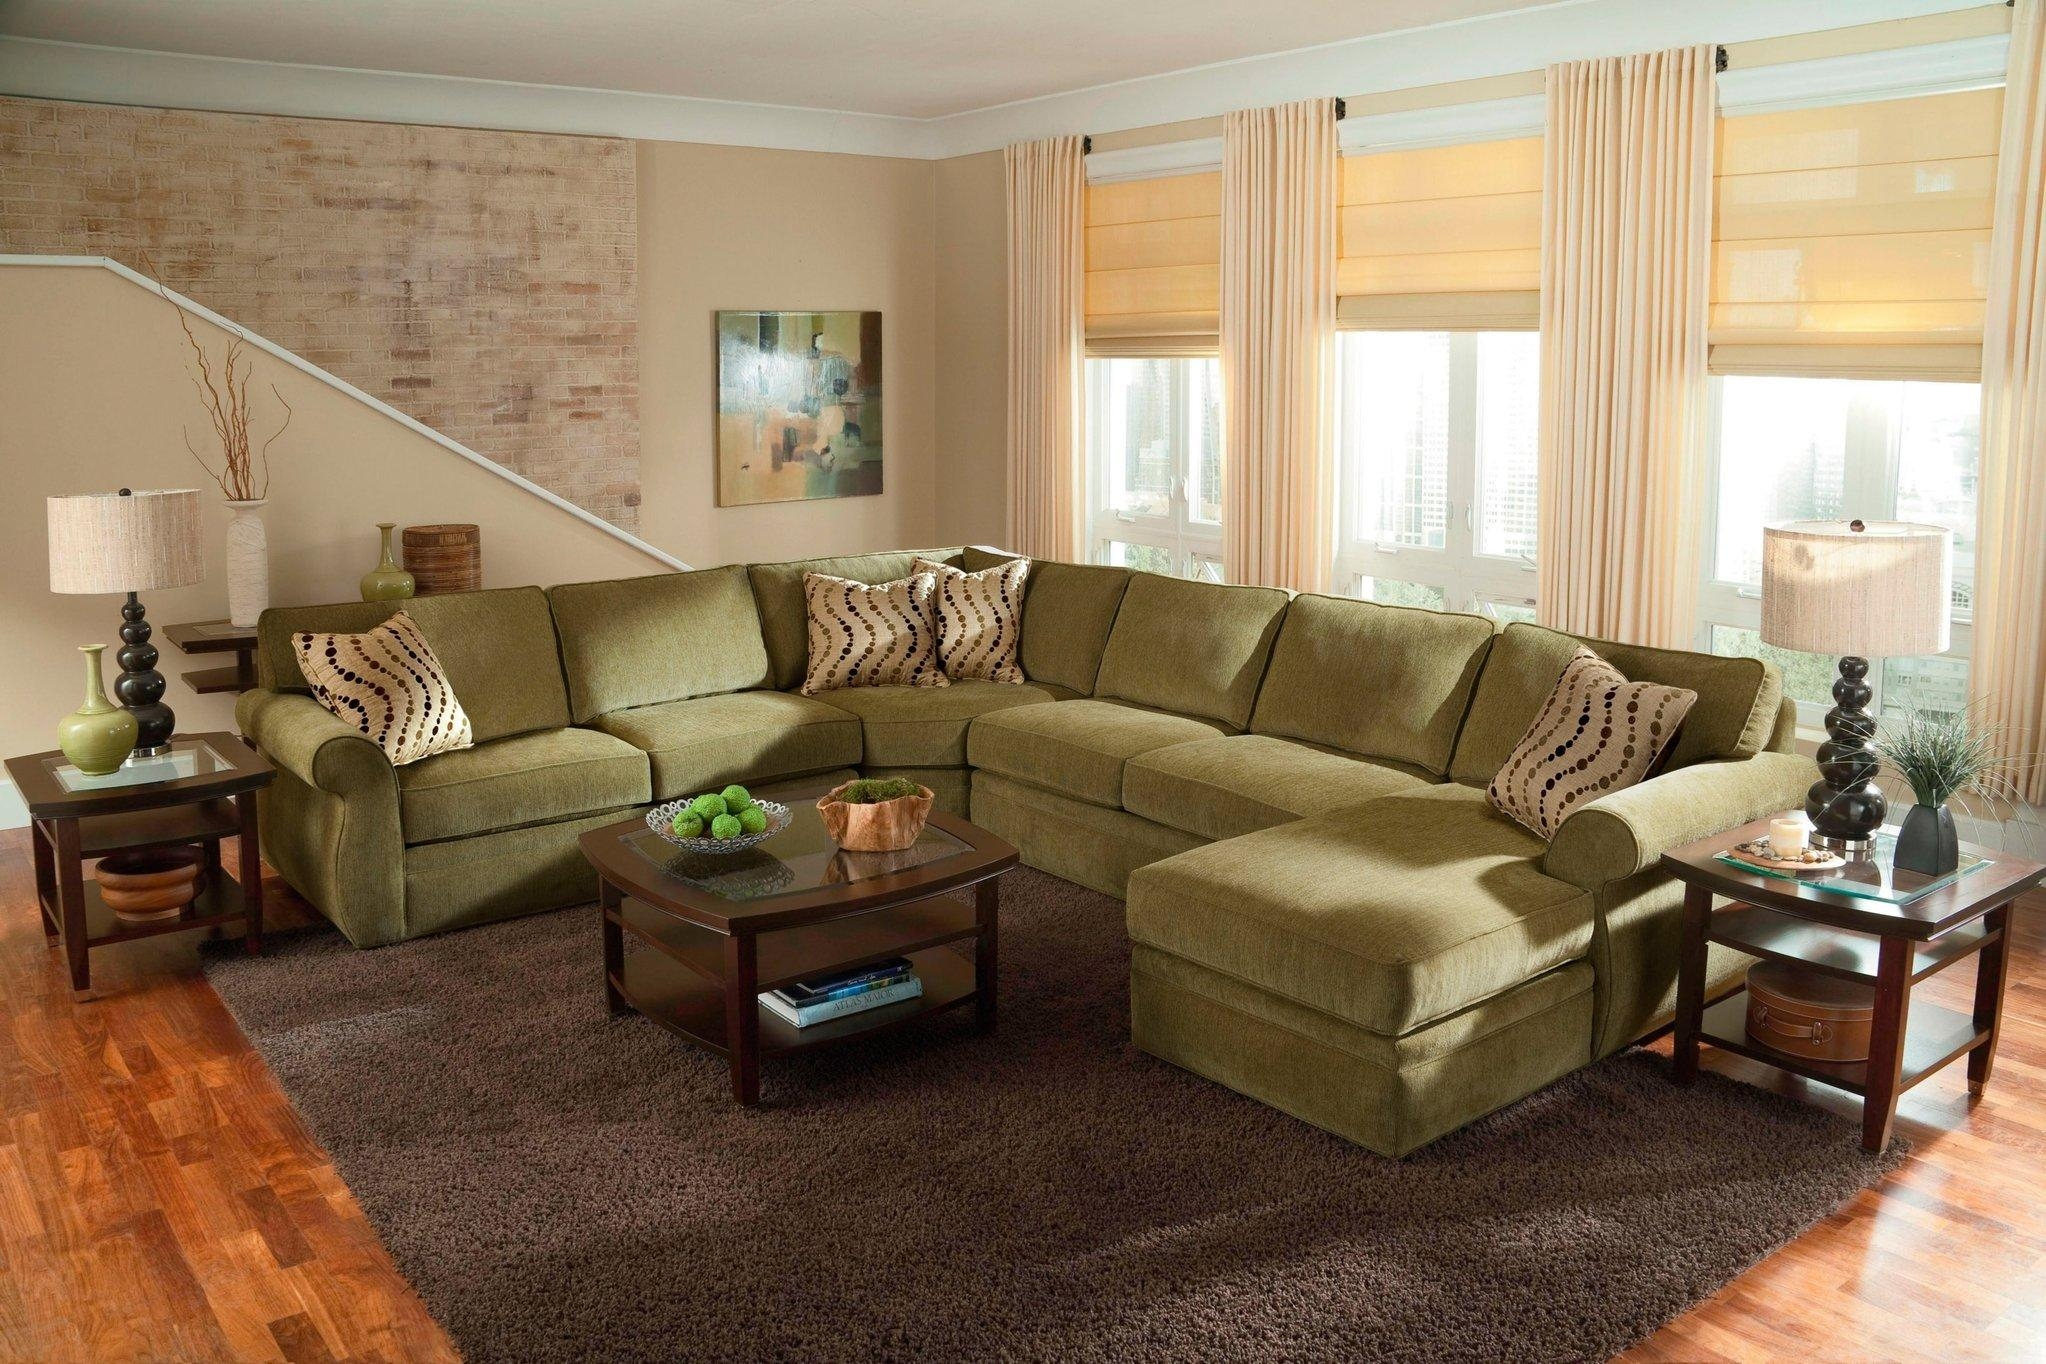 Furniture: Extra Large Sectional Sofa | Oversized Sectional Pertaining To Comfy Sectional Sofa (Image 10 of 15)